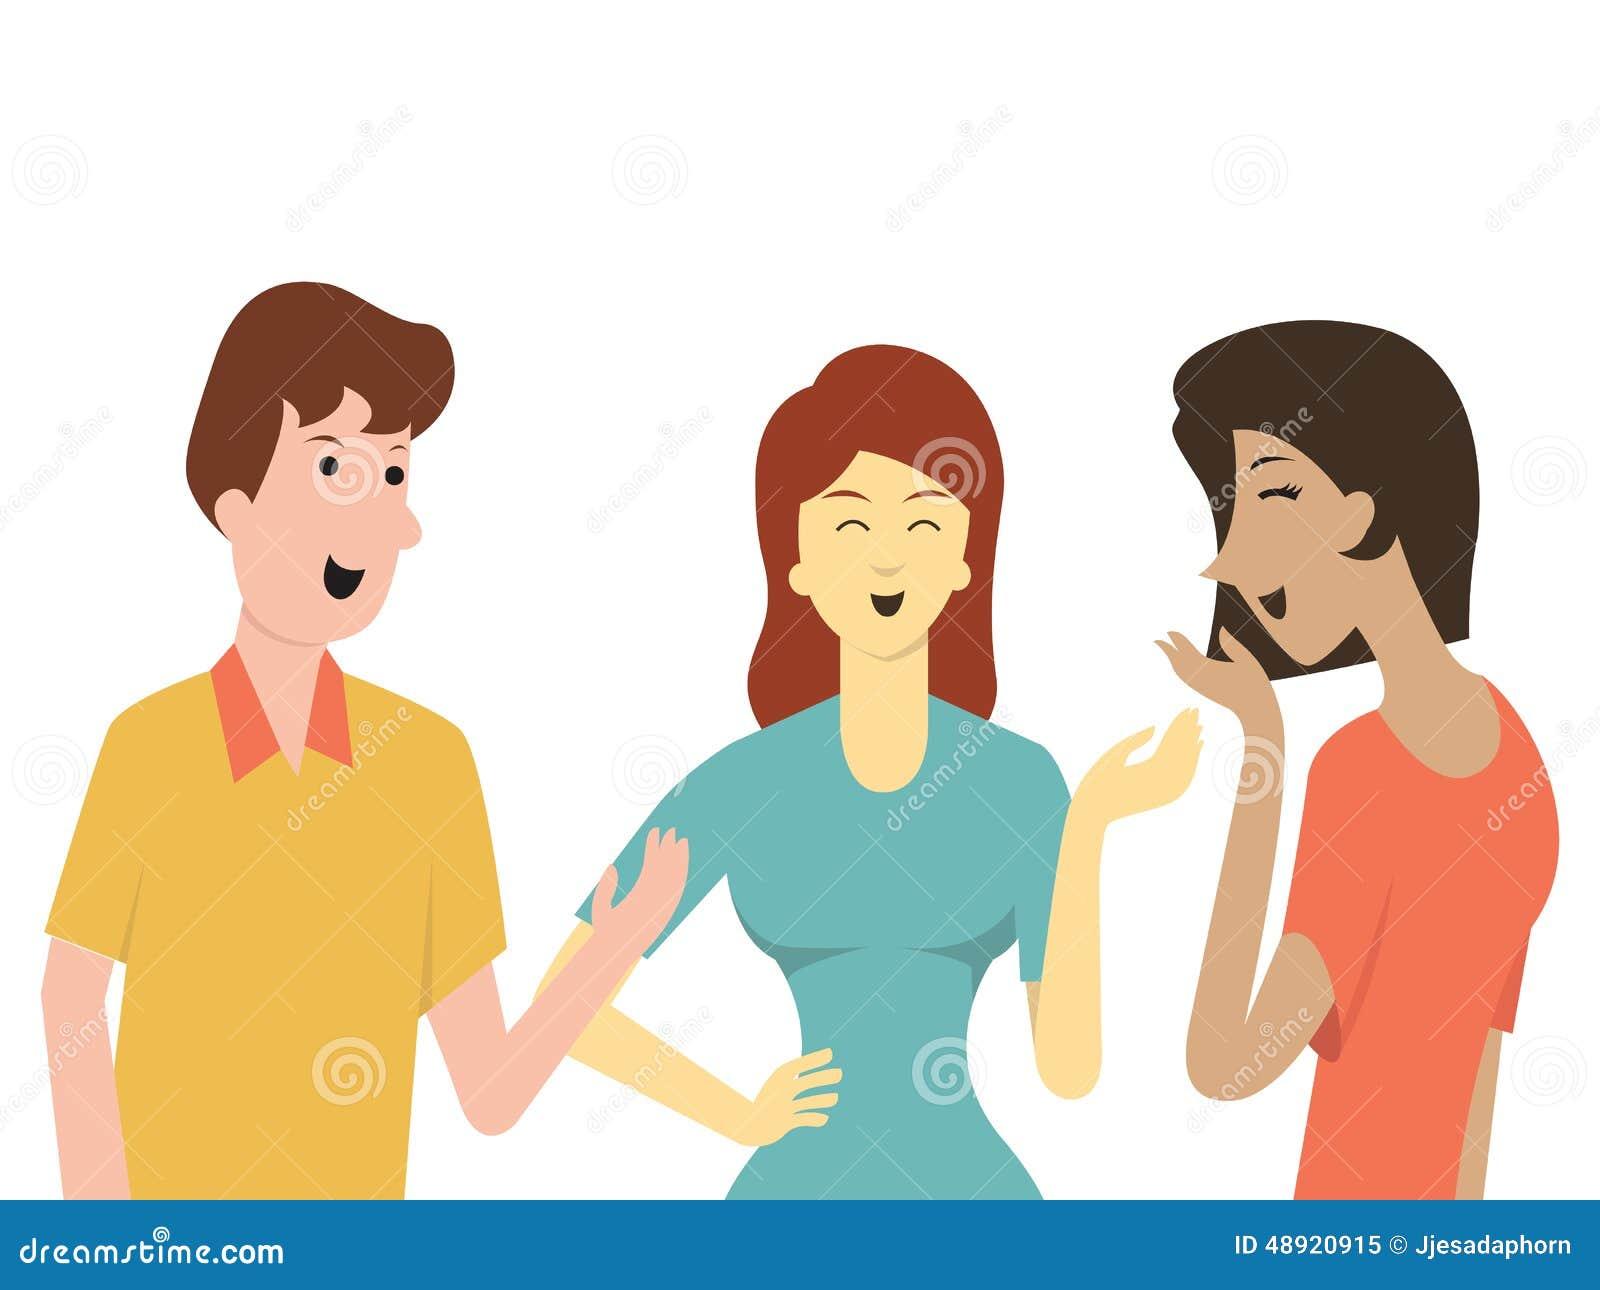 Women talking Vector | Free Download - freepik.com